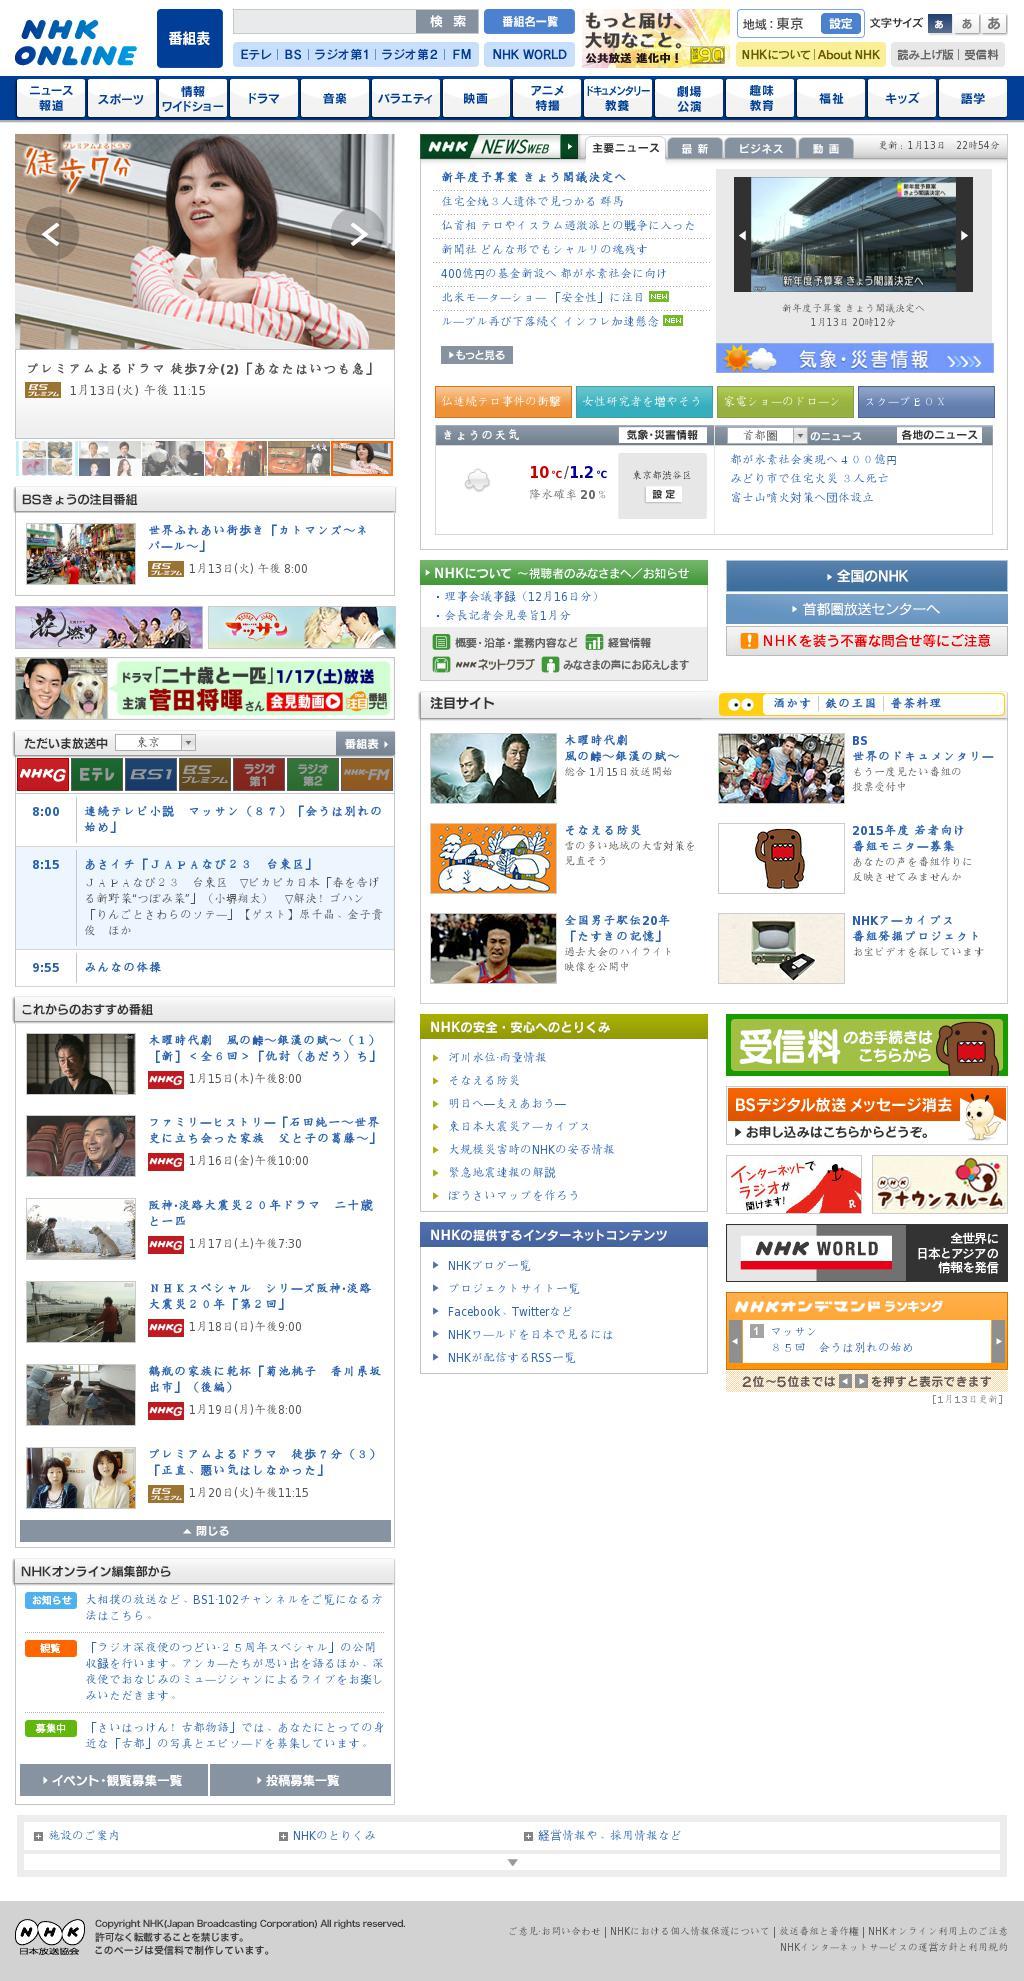 NHK Online at Tuesday Jan. 13, 2015, 11:18 p.m. UTC